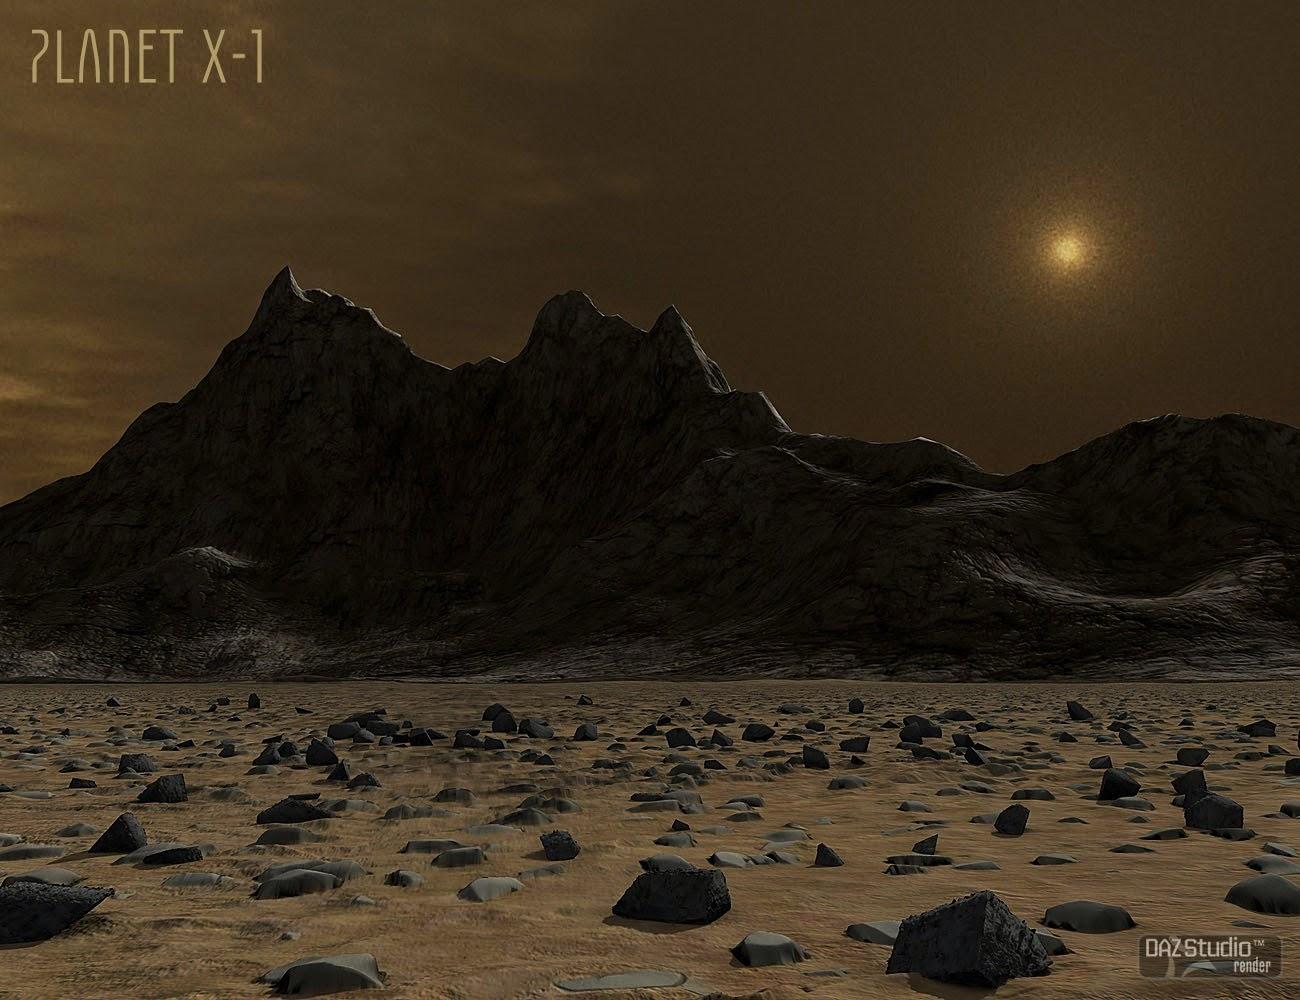 Planet X-1